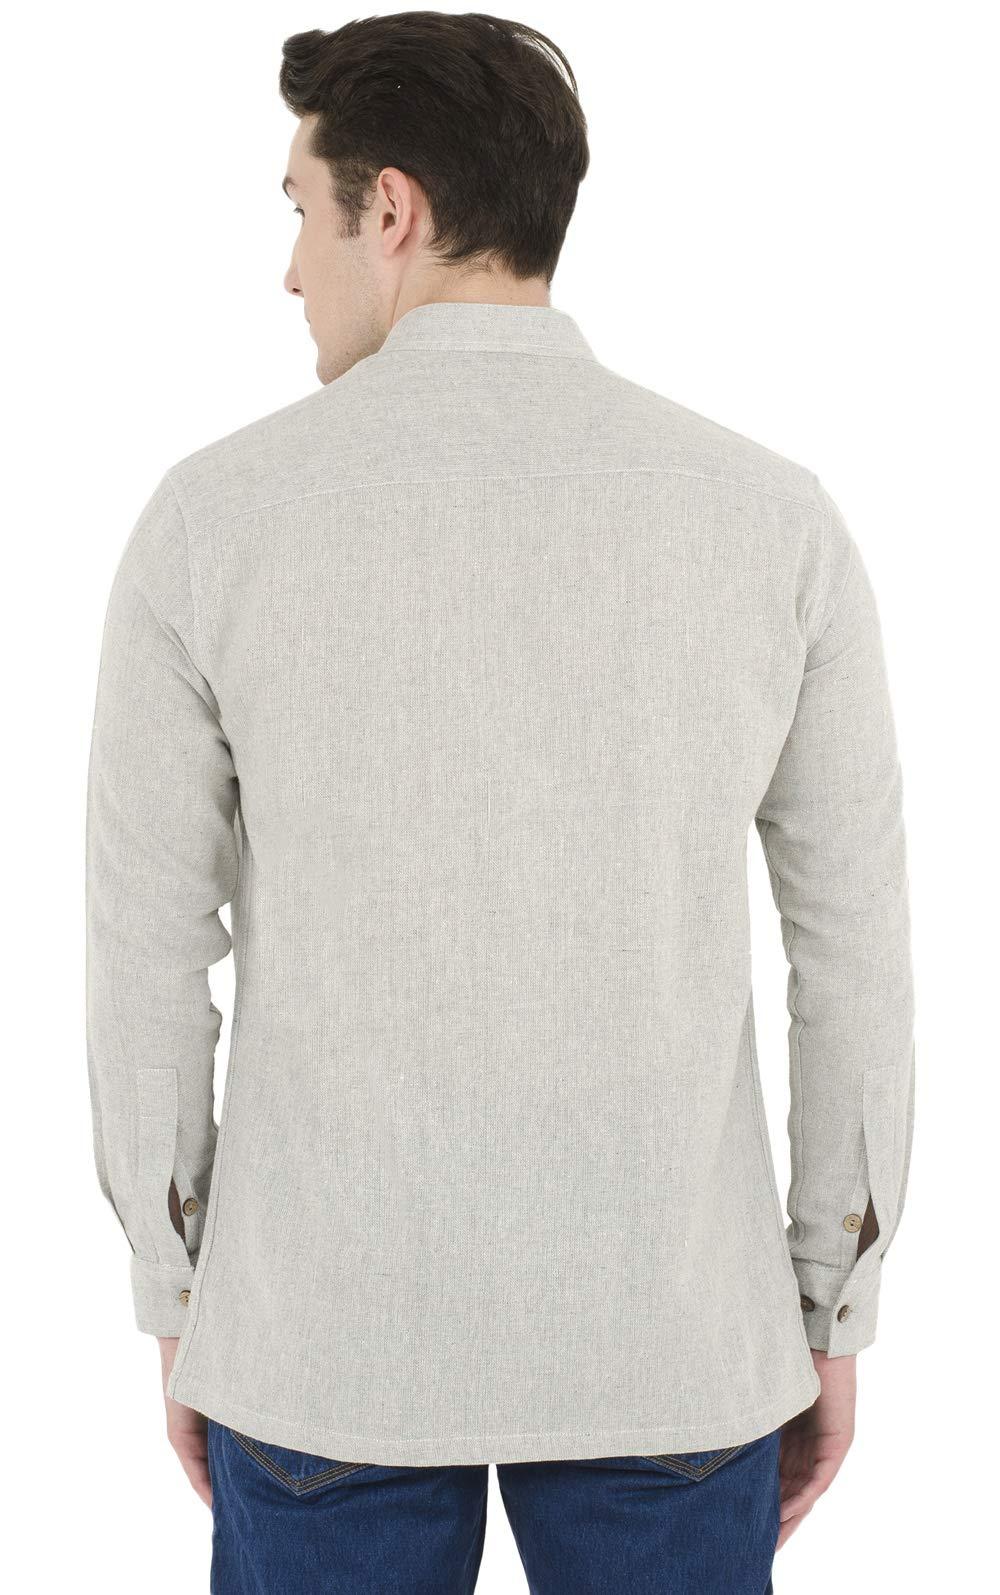 SKAVIJ Button Down Shirts for Men Cotton Long Sleeve Casual Shirts Regular Fit Grey by SKAVIJ (Image #5)